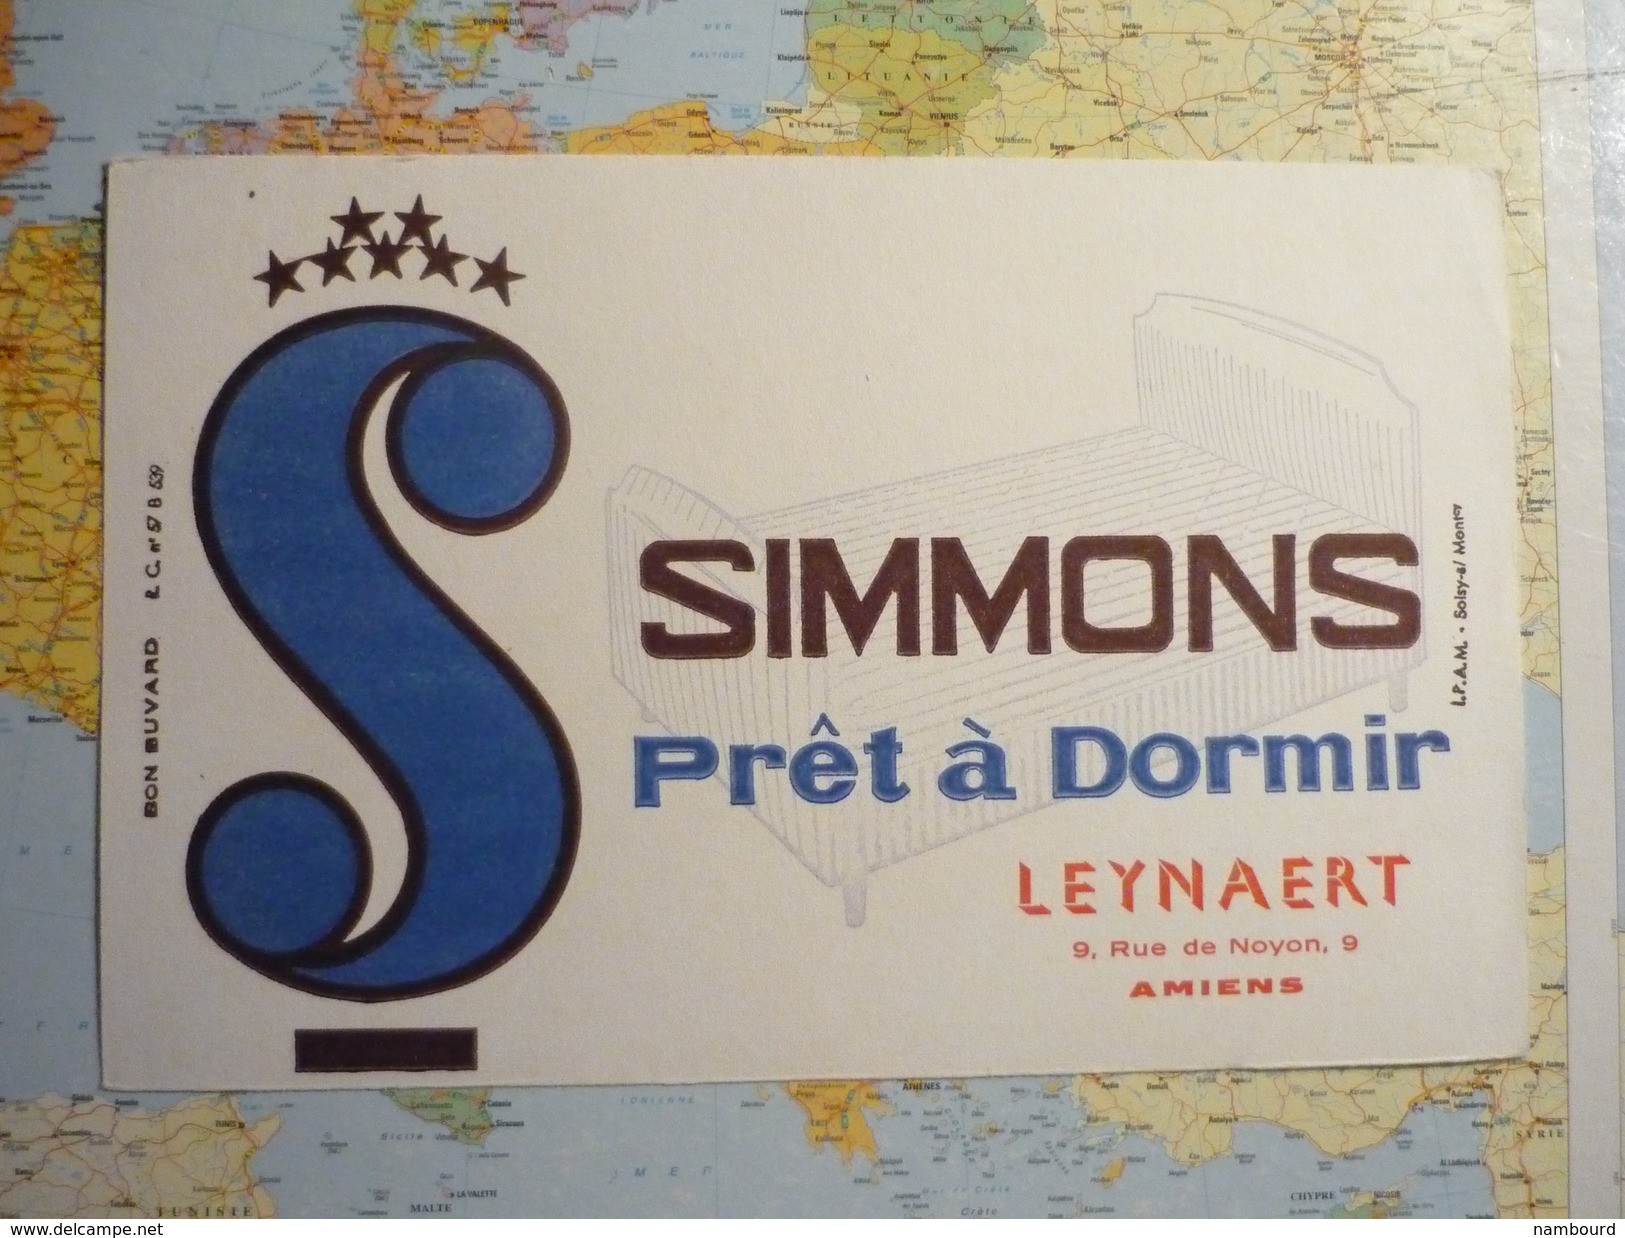 Simmons Prêt à Dormir Leynaert Amiens 1 - Buvards, Protège-cahiers Illustrés